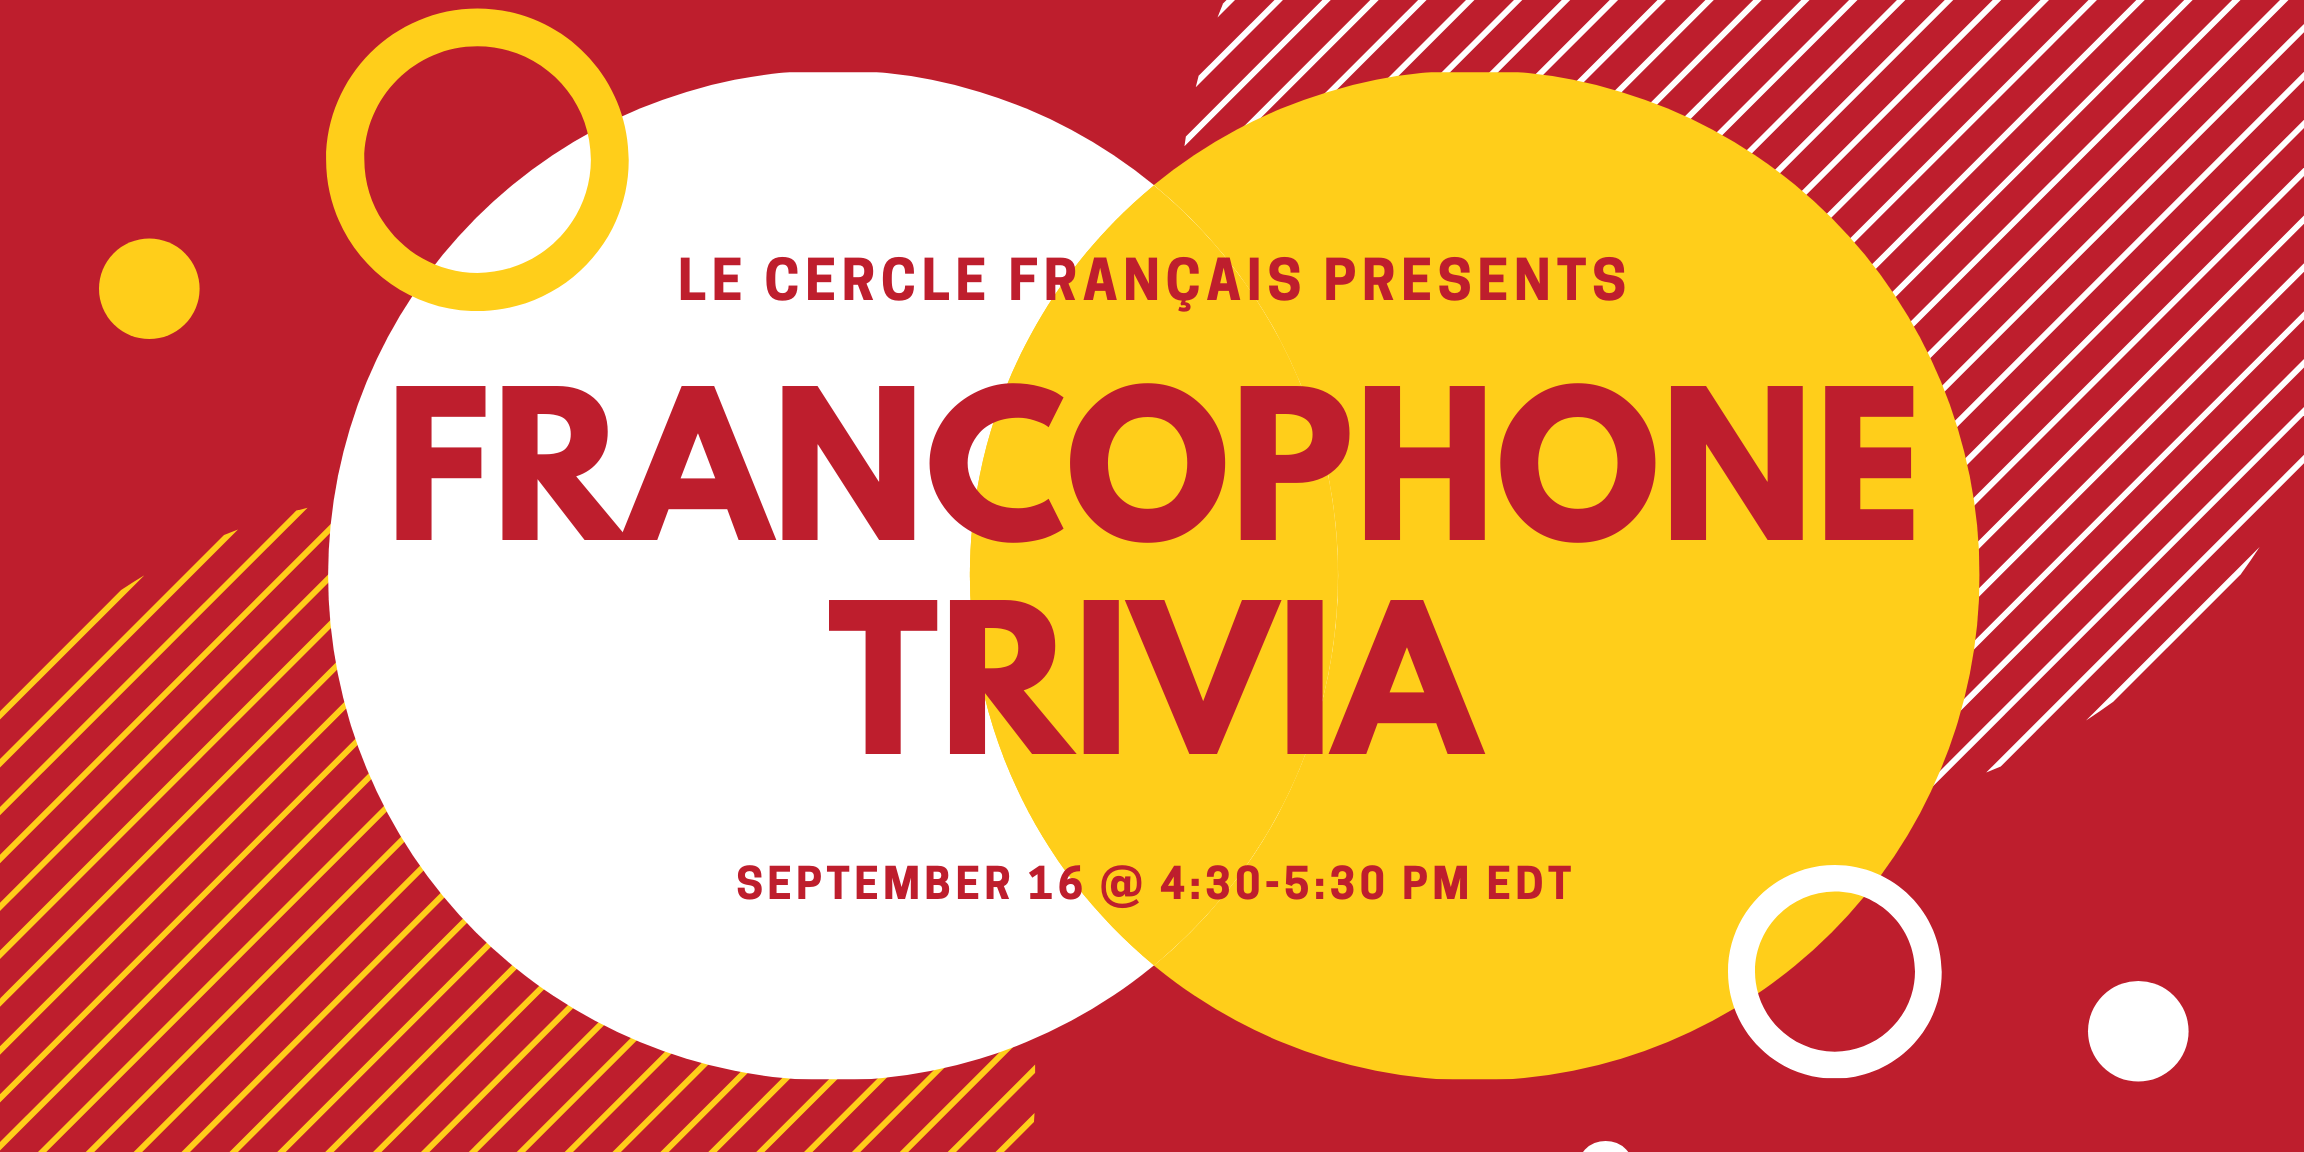 Francophone Trivia